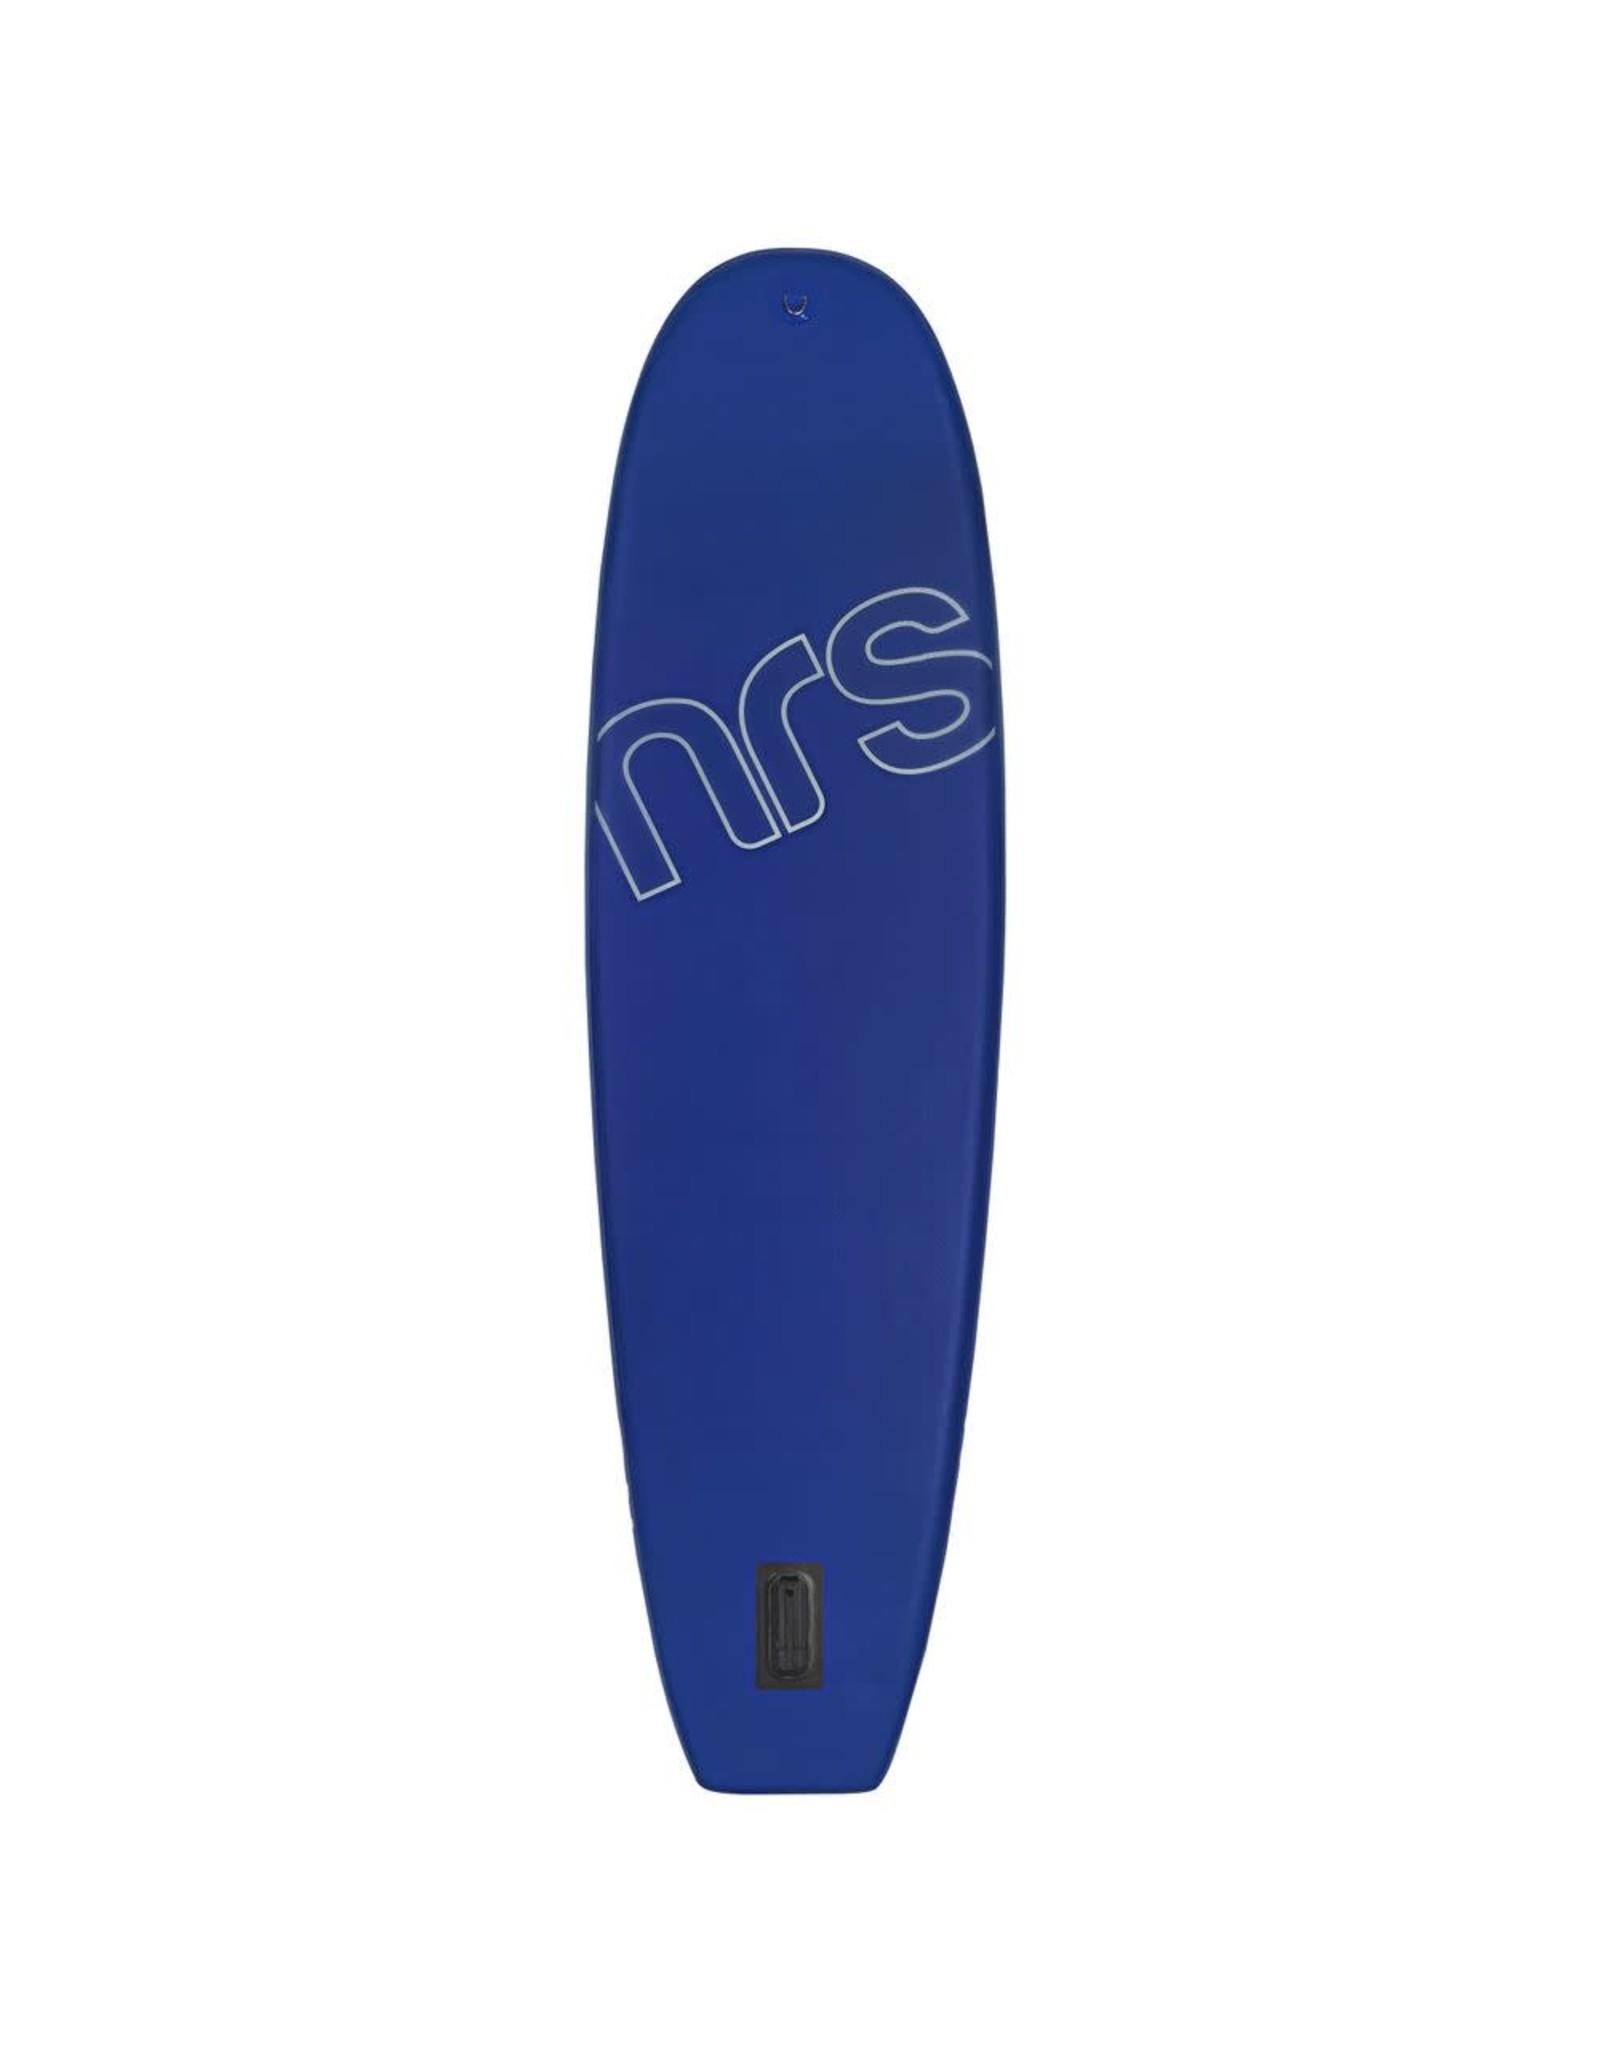 NRS NRS Cruz XL Inflatable SUP Board